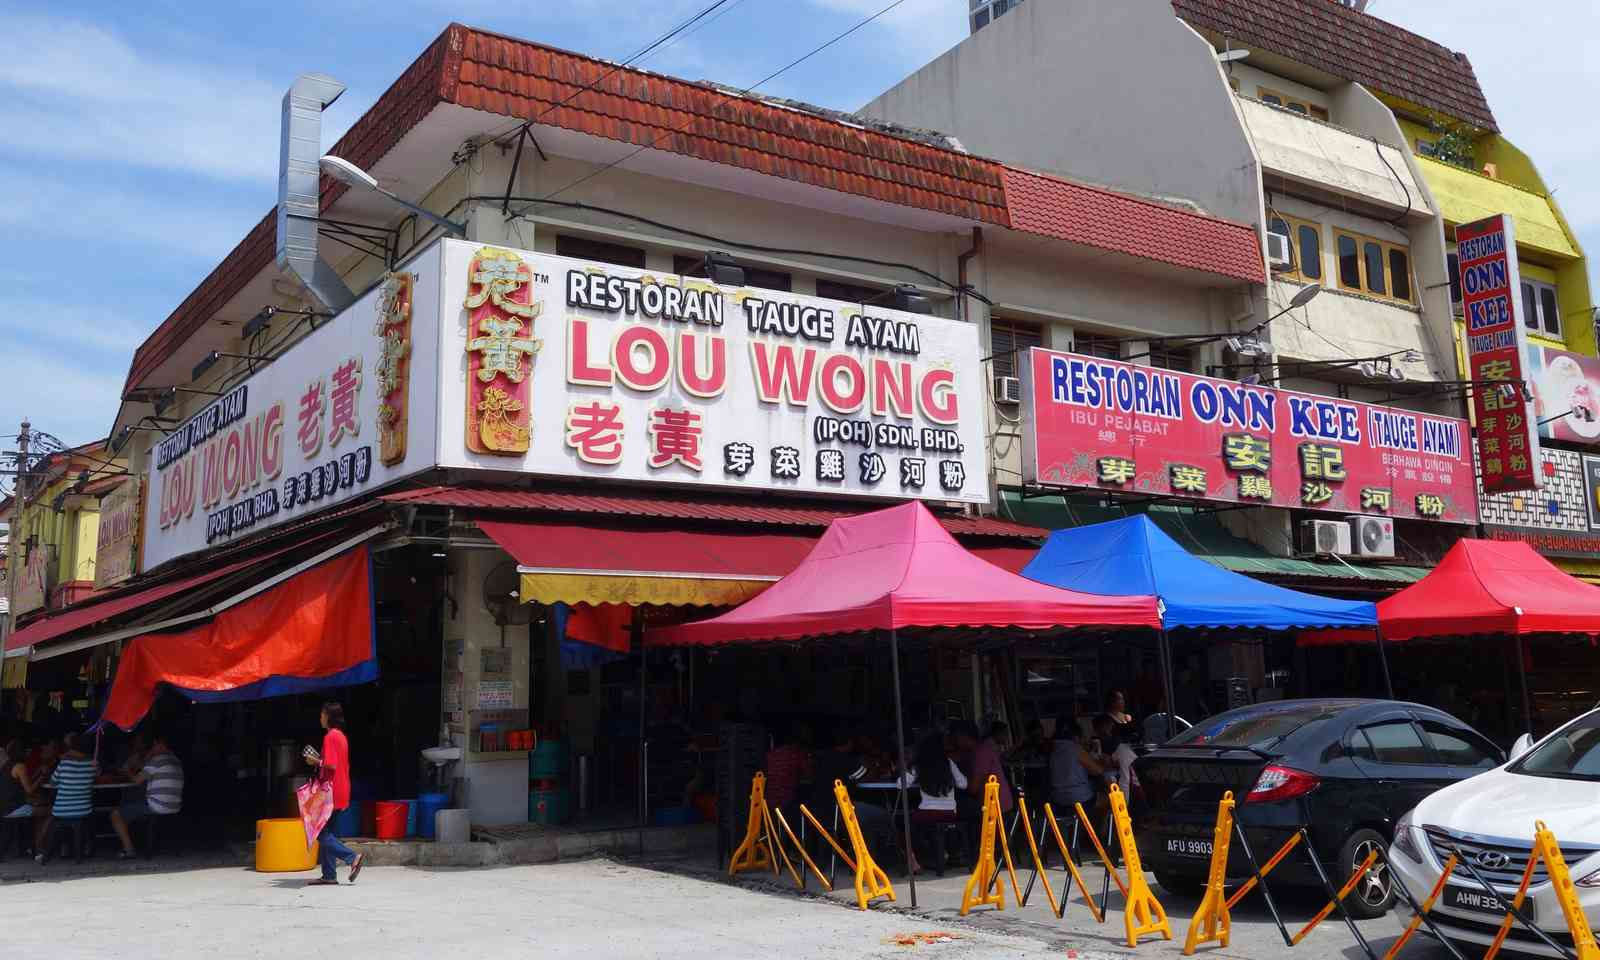 Lou Wong restaurant in Ipoh (Dreamstime)